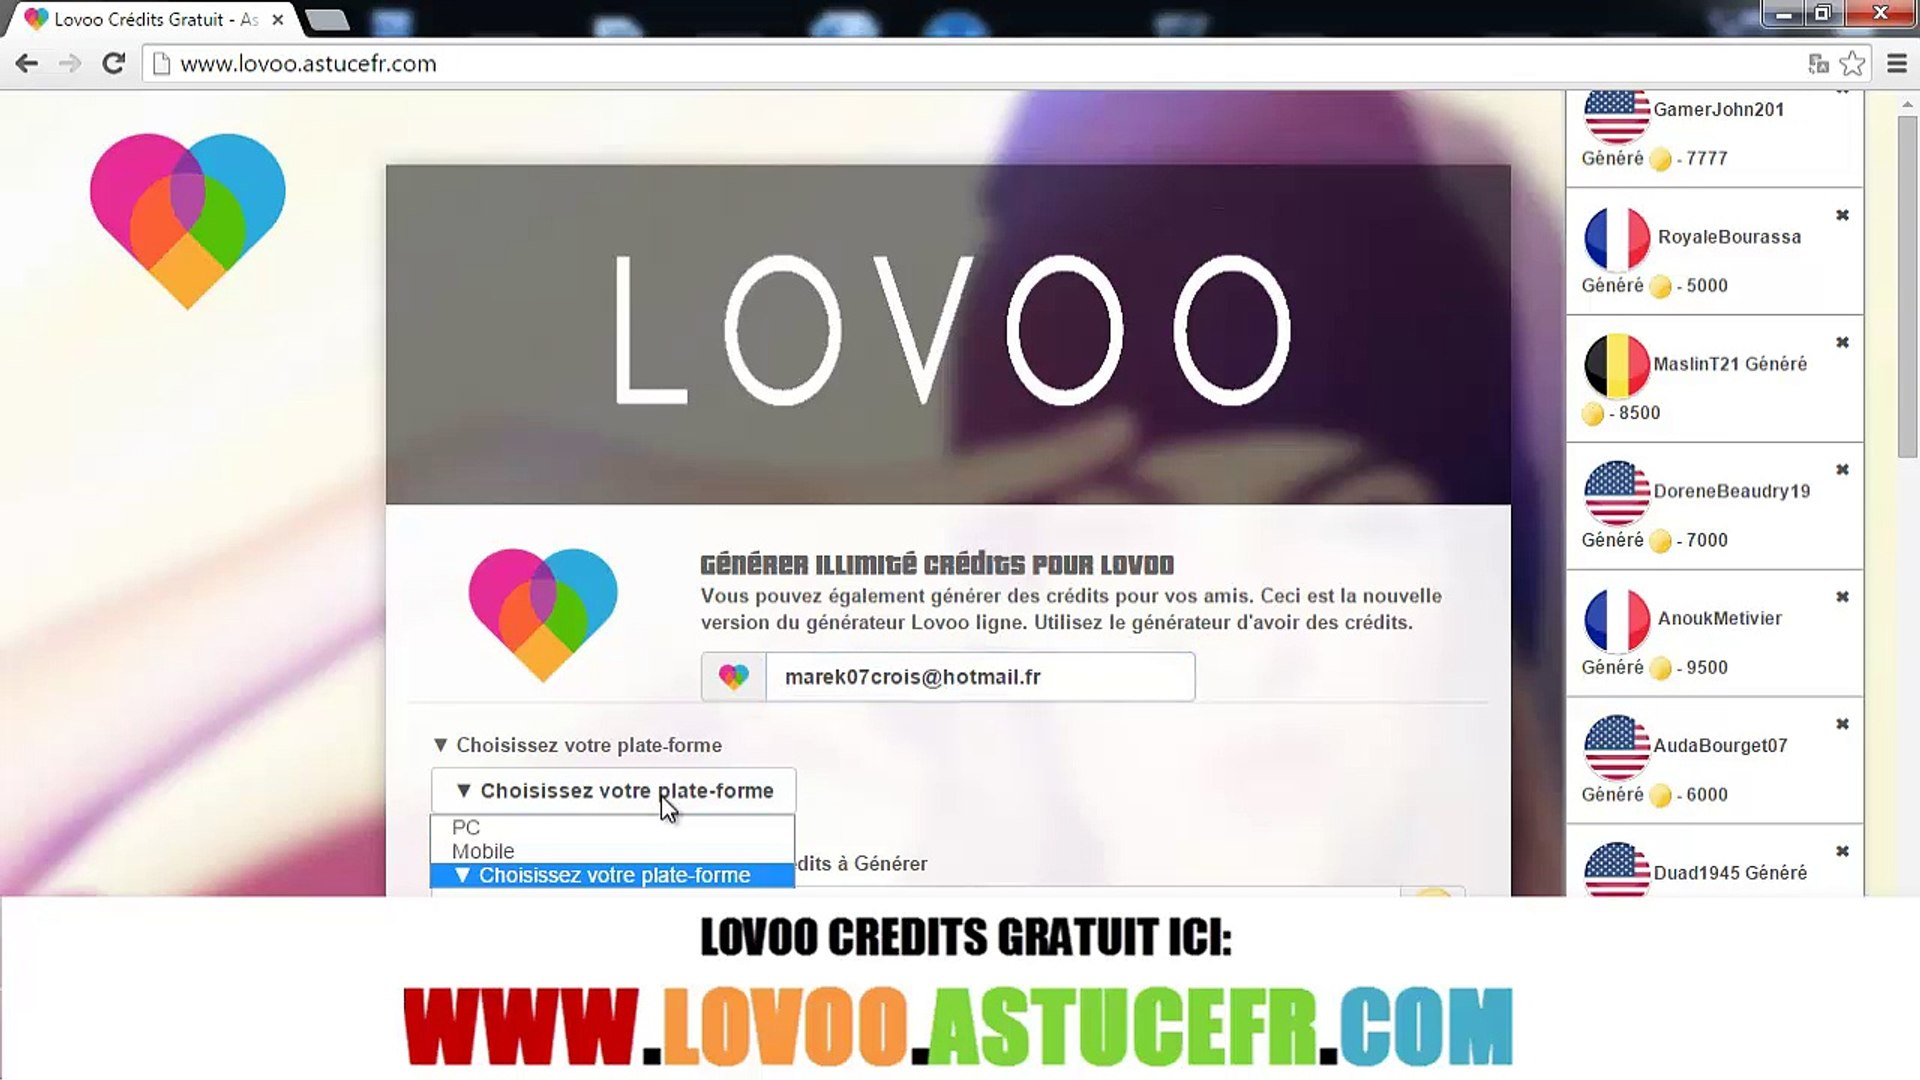 Lovoo free credits erhalten